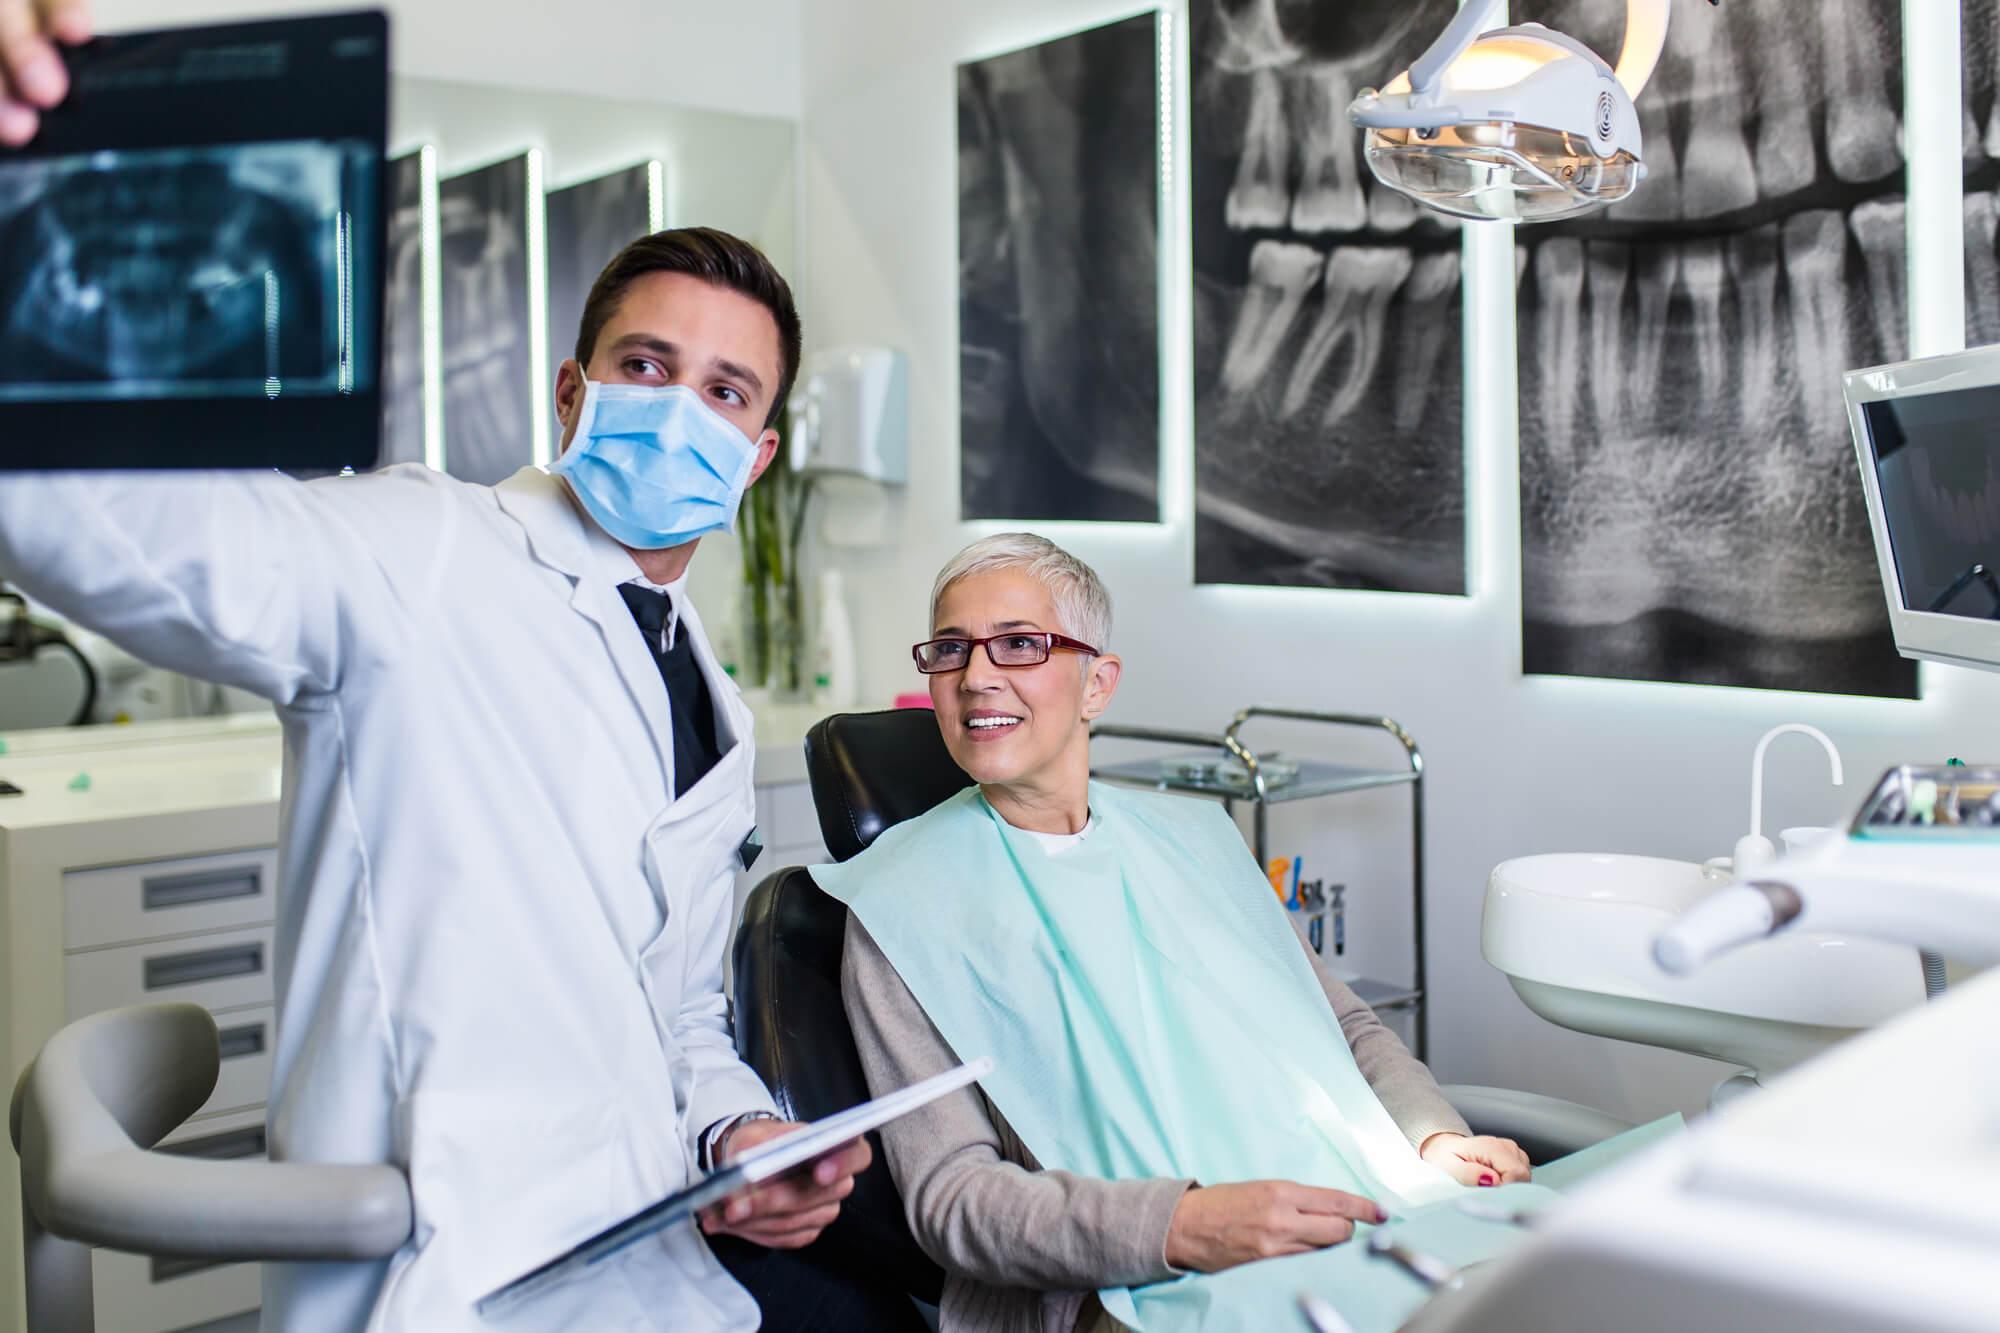 woman dental implants palm beach gardens